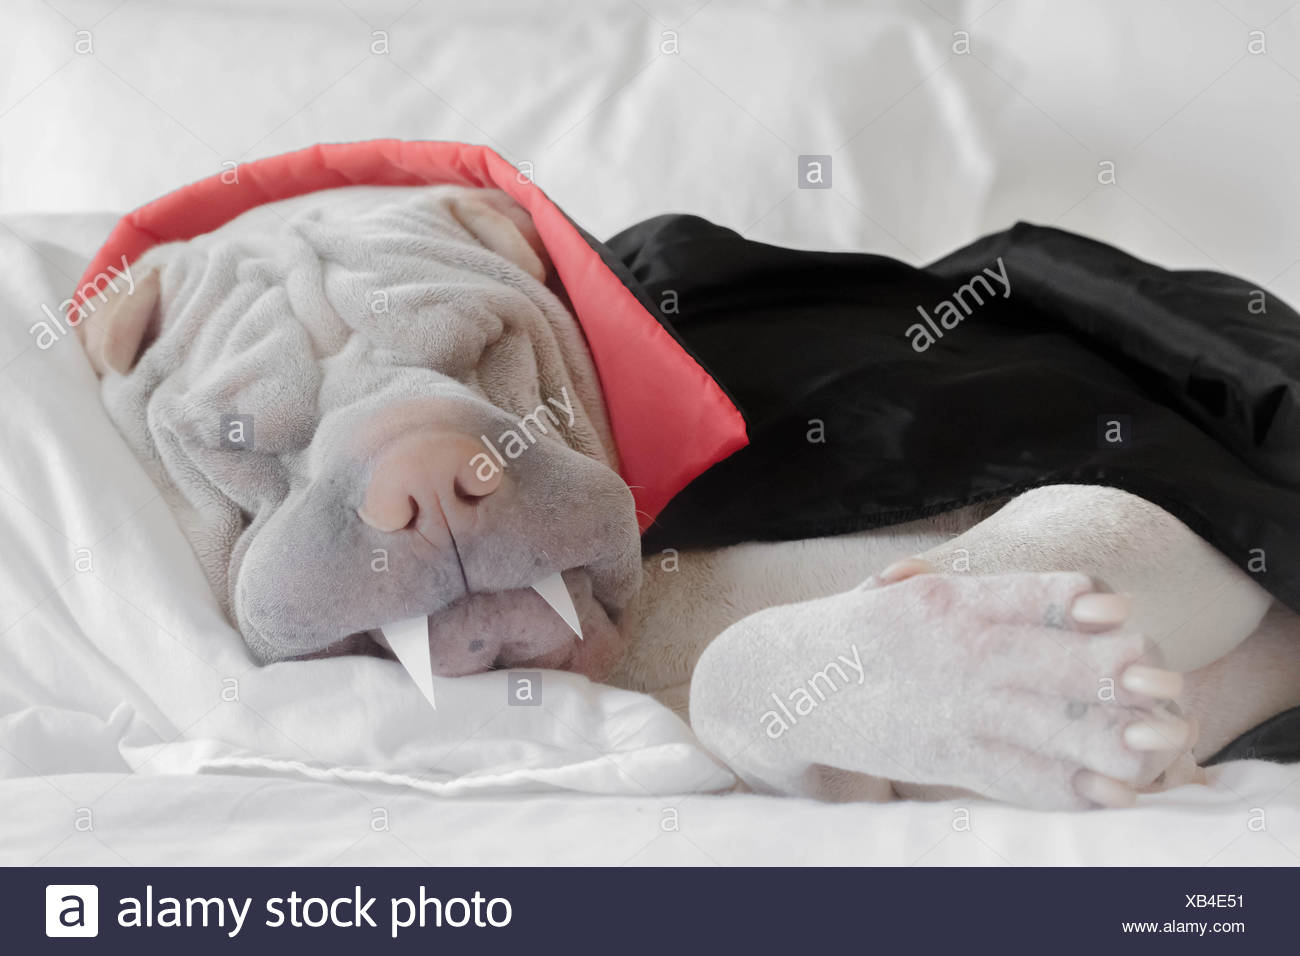 Shar pei dog dressed as a vampire sleeping - Stock Image